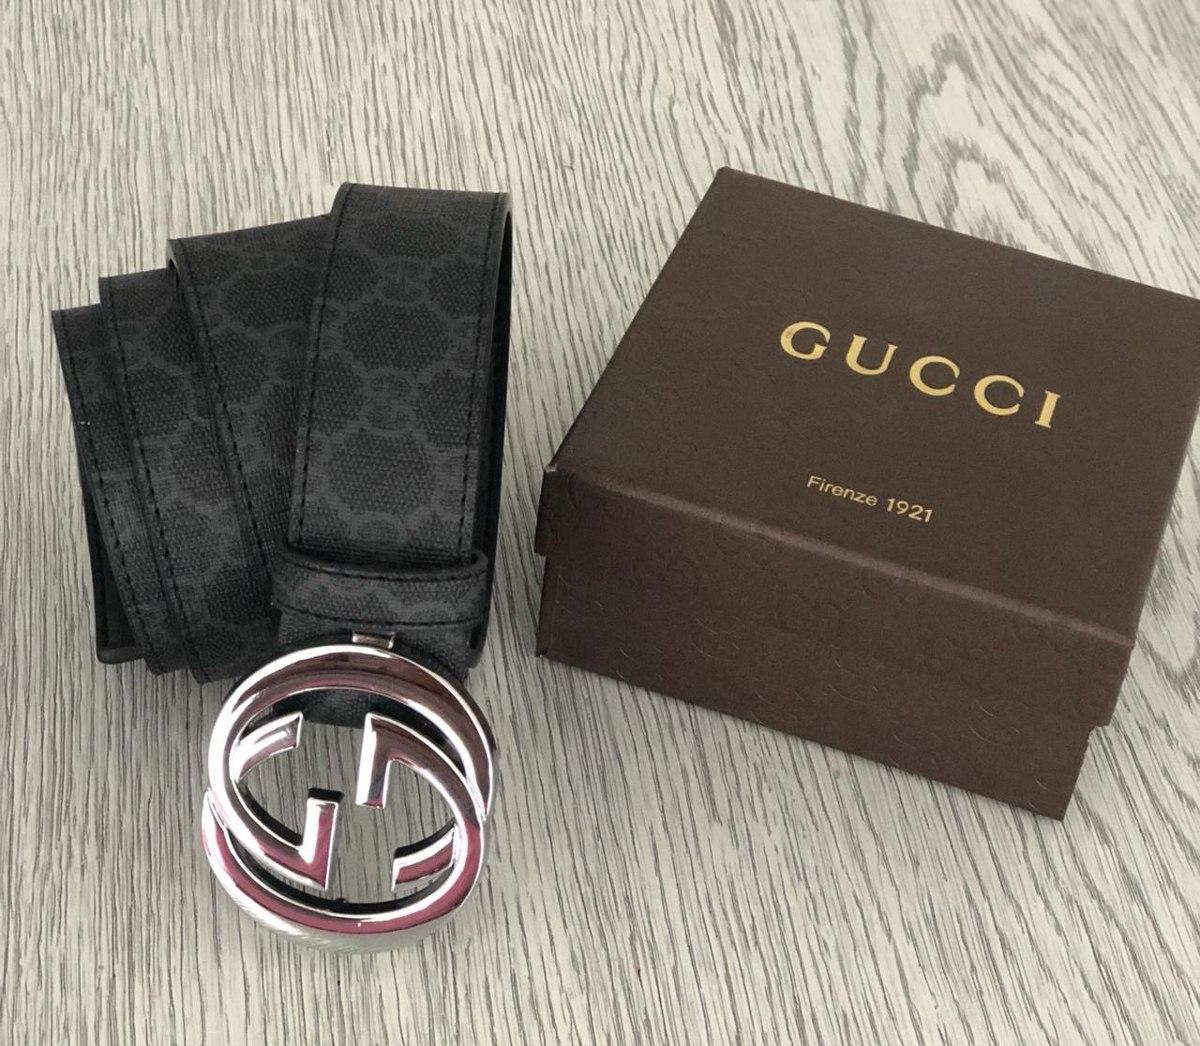 e6ed6d1c68e31 Correa Cinturones Gucci Hombre Negra Blanca Precio -   58.000 en ...